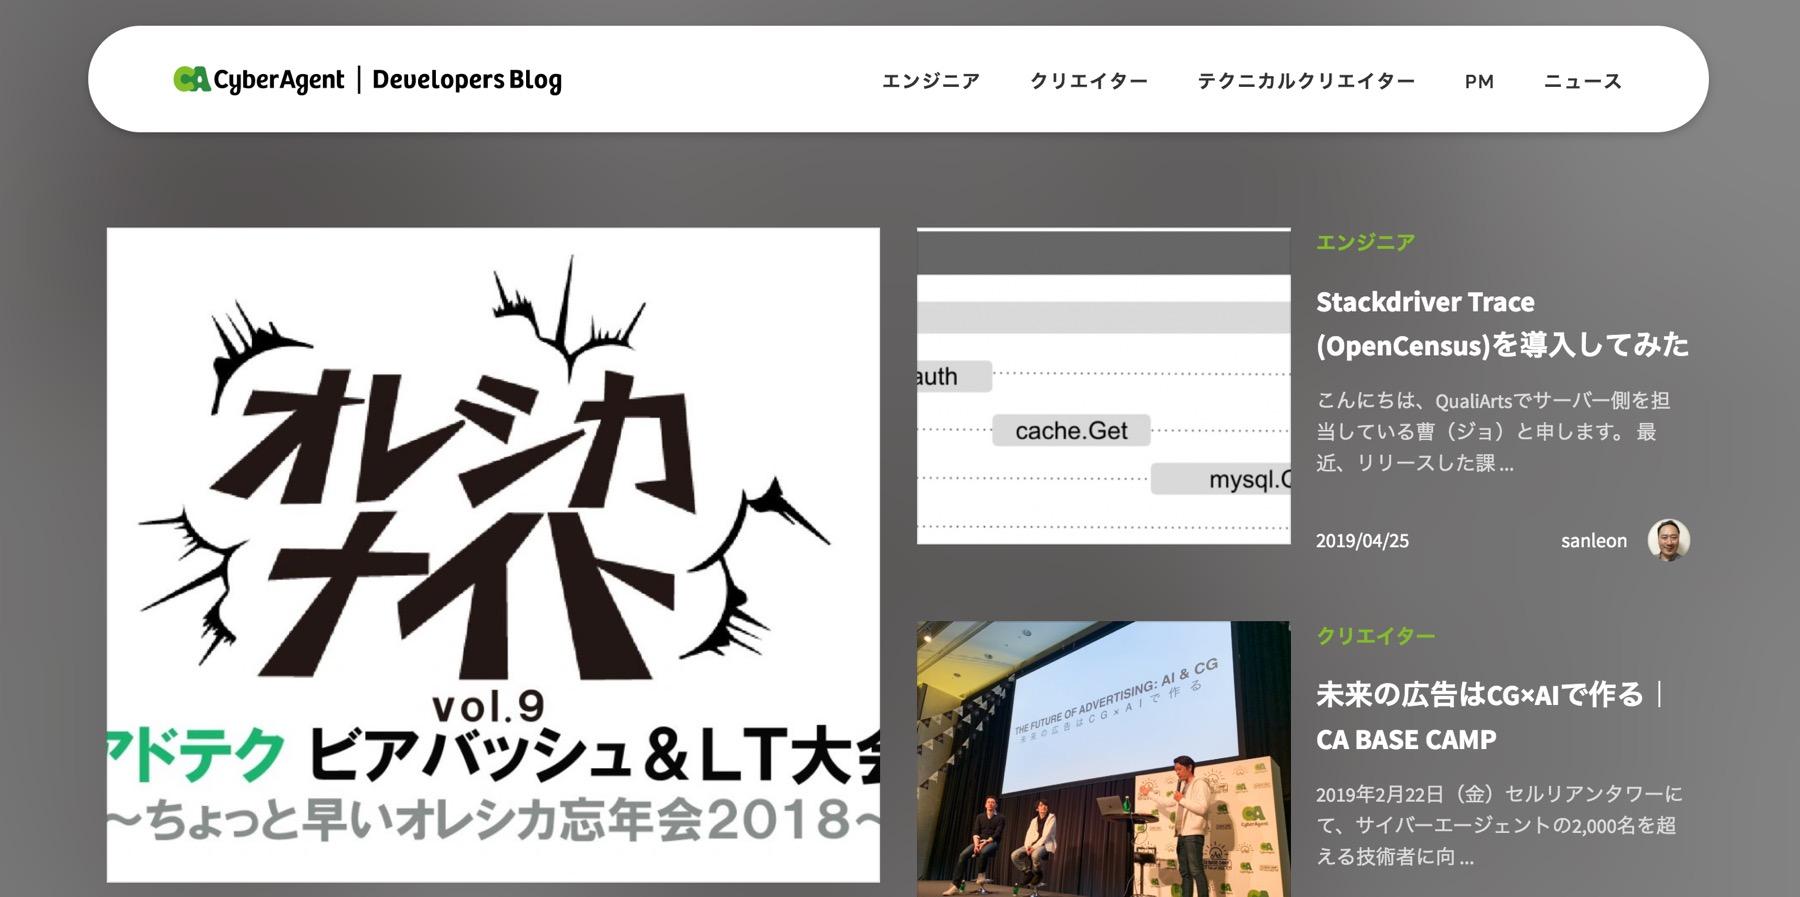 CyberAgent Developers Blog